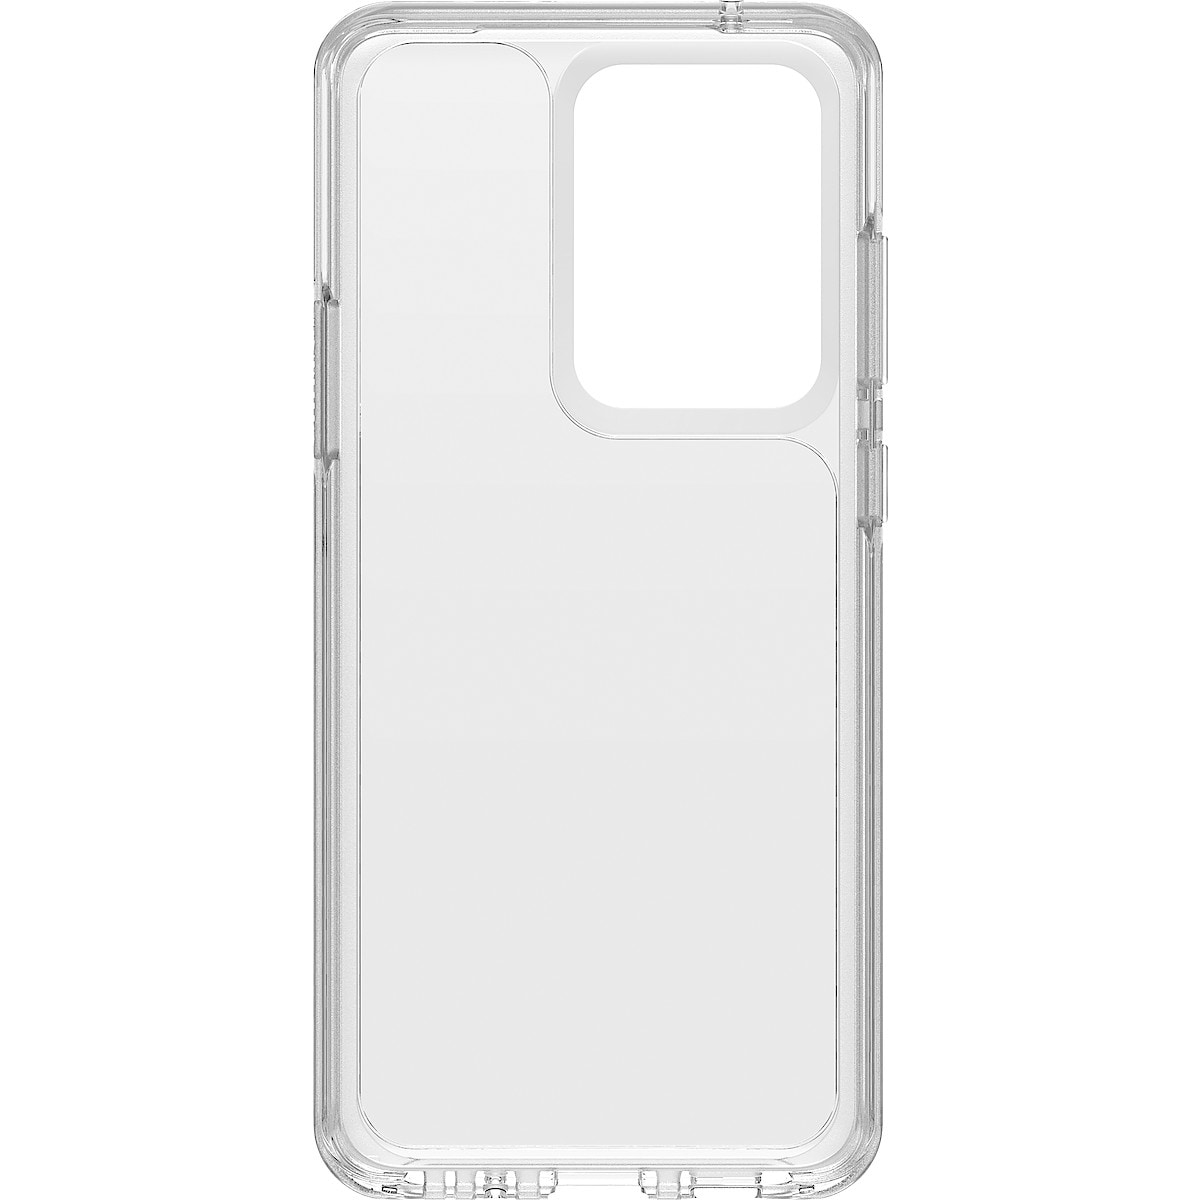 Otterbox Symmetry Clear deksel til Samsung Galaxy S20 Ultra